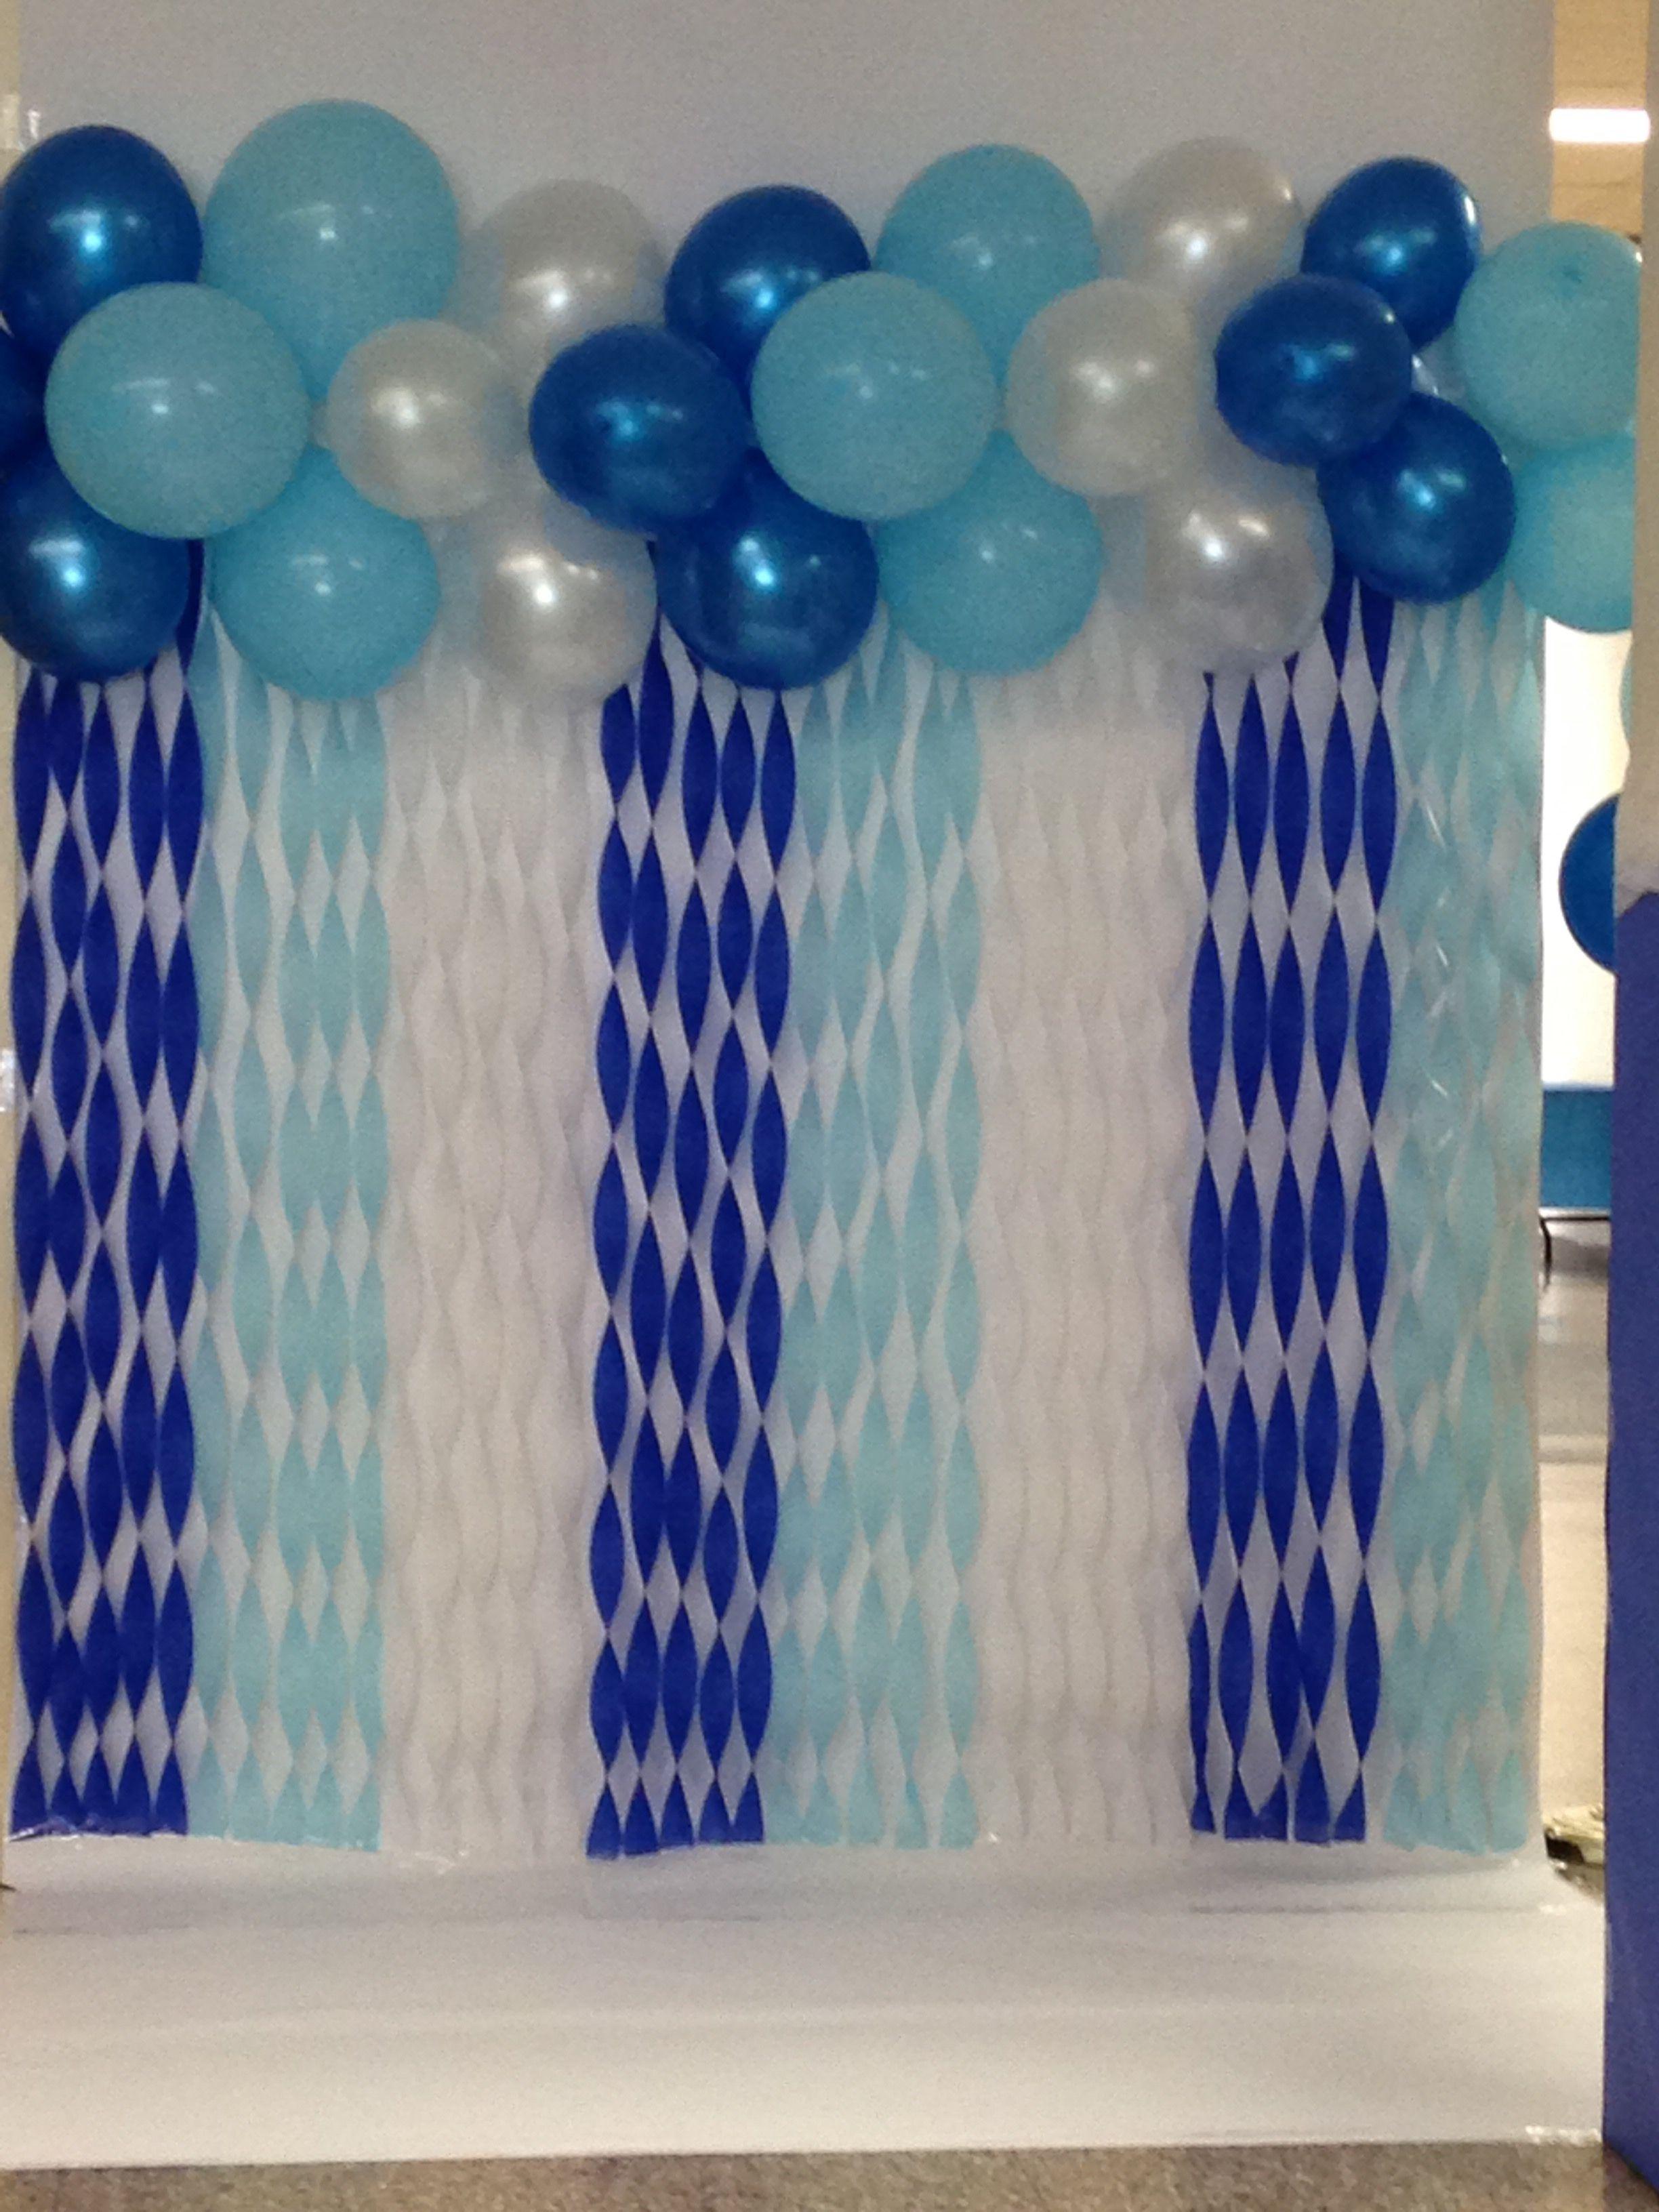 Pin by teresa dunaway beaupre on dance decoracion fiesta - Decoracion para cumpleano ...